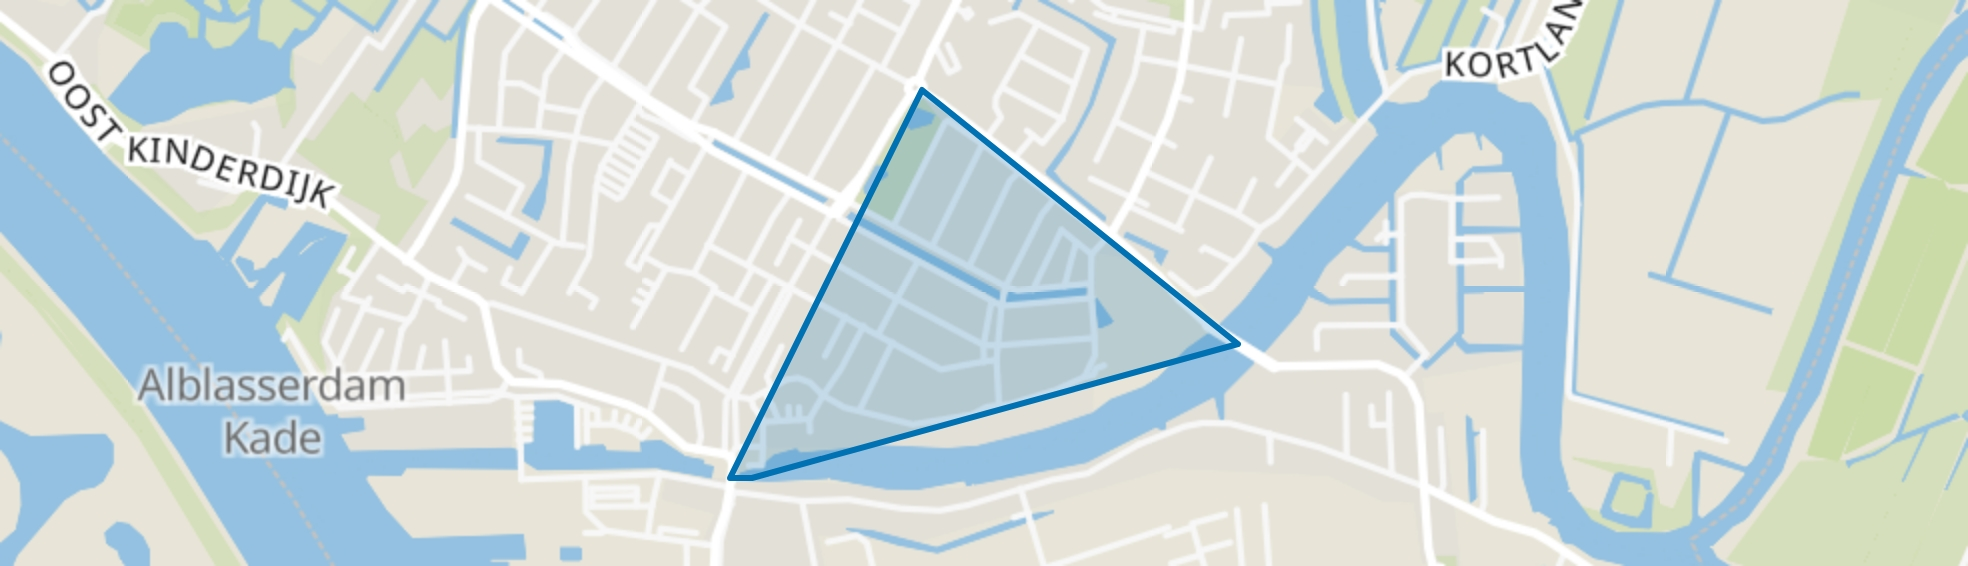 kerkbuurt, Alblasserdam map